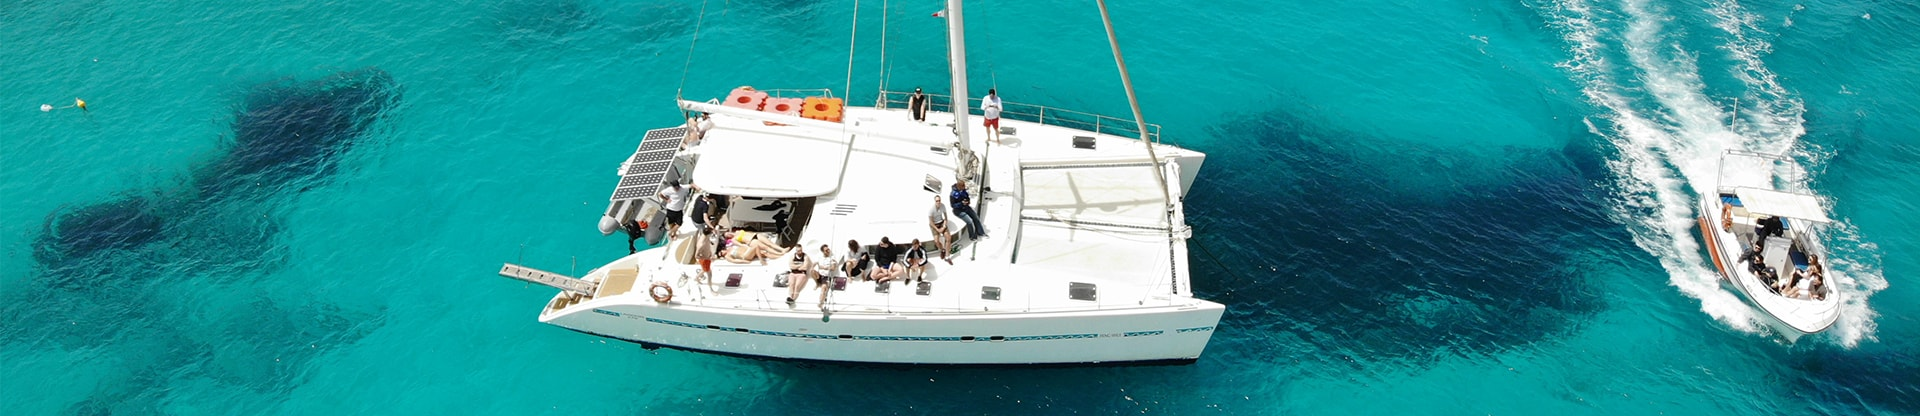 Meetio-teamet på en båt i Medelhavet